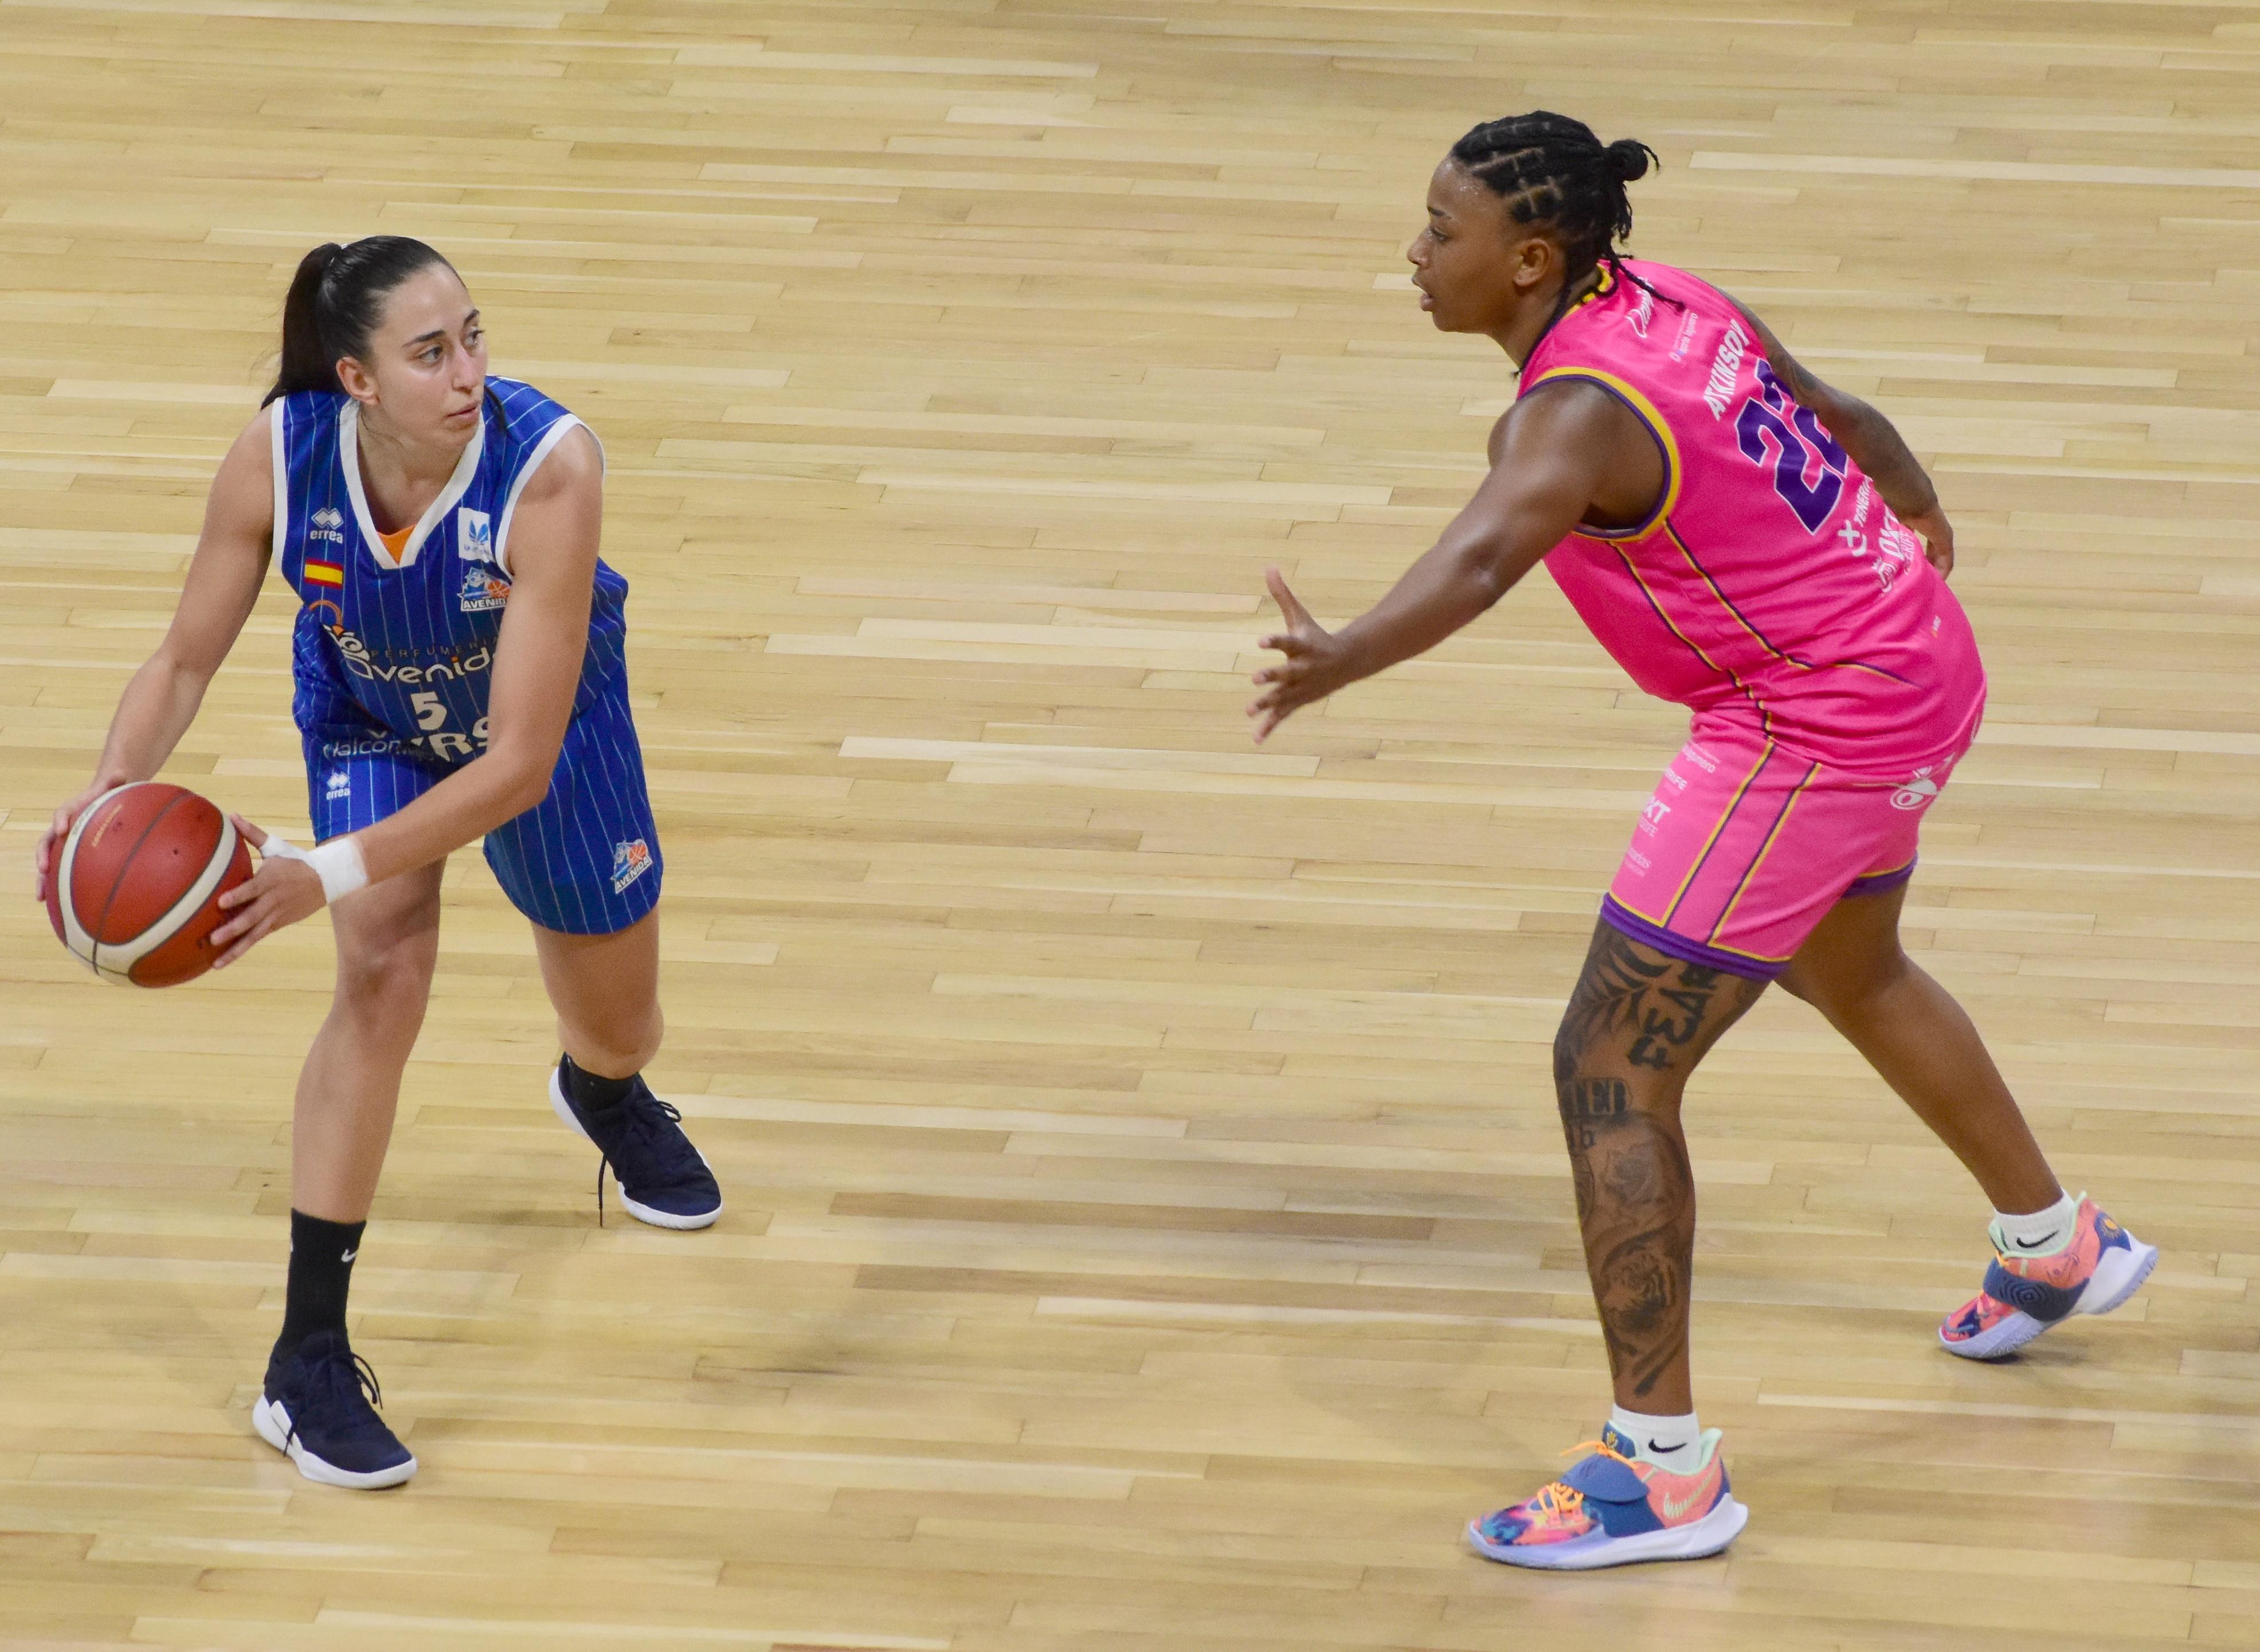 Maite Cazorla, Revelación Nacional de la temporada en Liga Femenina